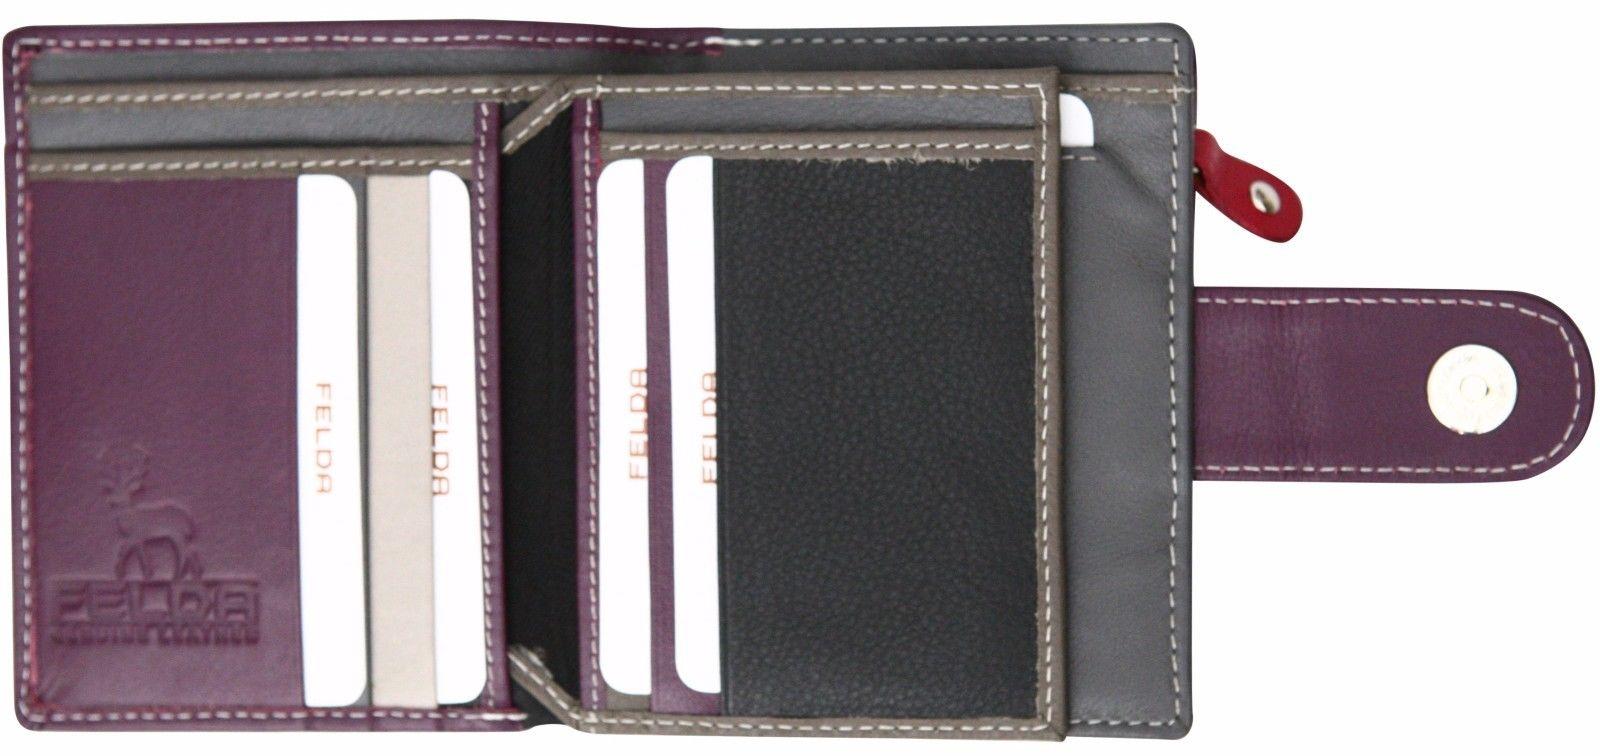 Felda-RFID-onorevoli-MEDAGLIA-amp-Card-Purse-Wallet-Genuine-Leather-Multi-SOFT-BOX-REGALO miniatura 95